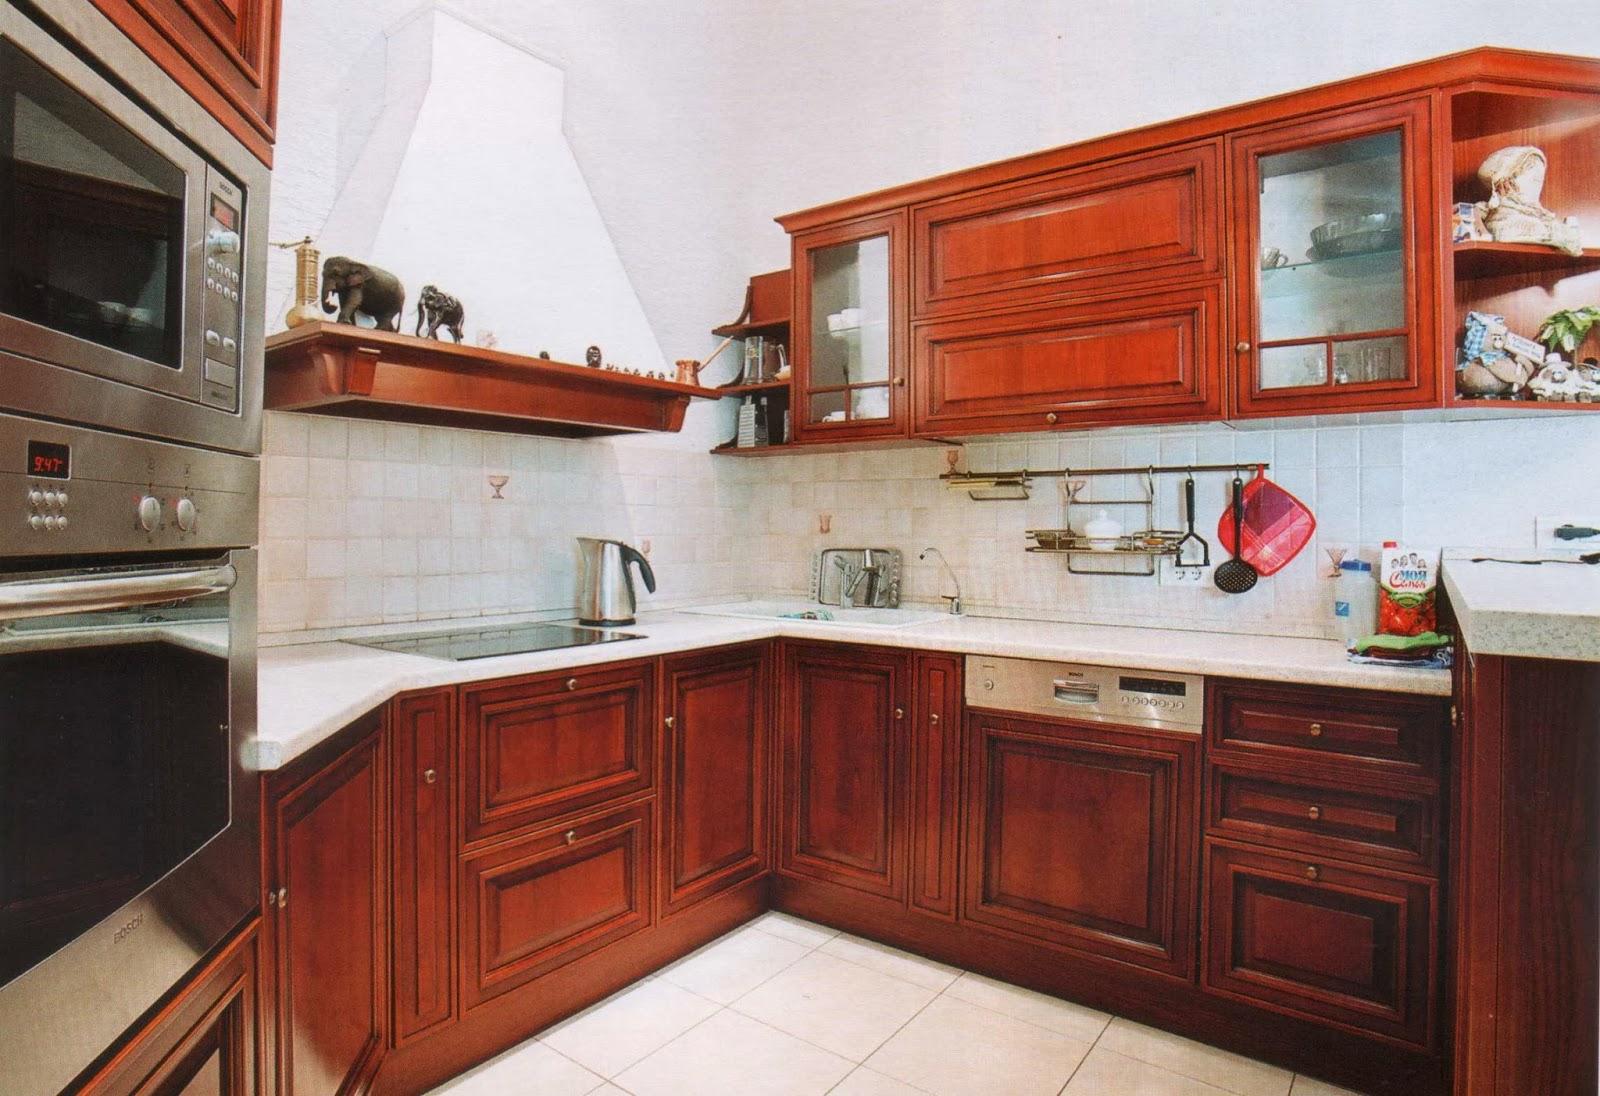 mecc pakistan: kitchen design